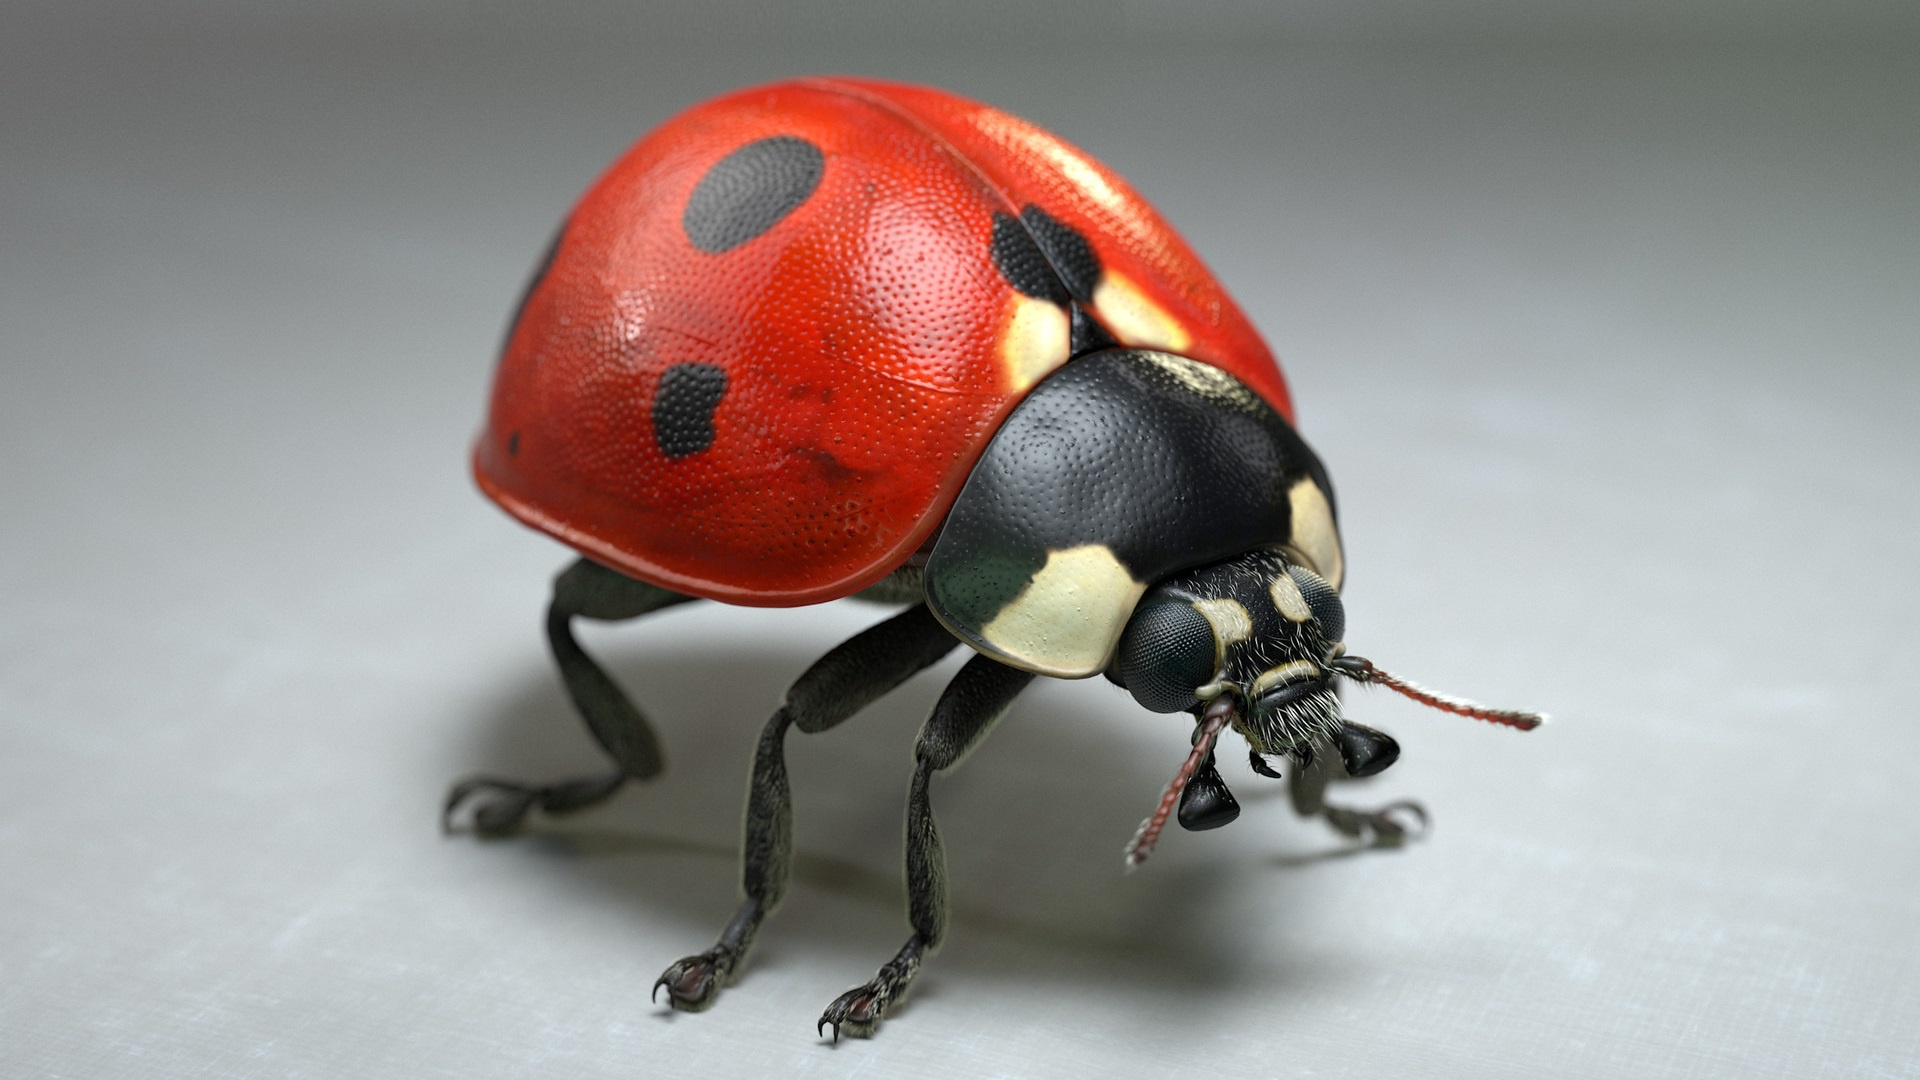 Images Ladybugs Jocelyn Strob Simard Closeup Animals Gray background Ladybird Lady beetle Coccinellidae animal